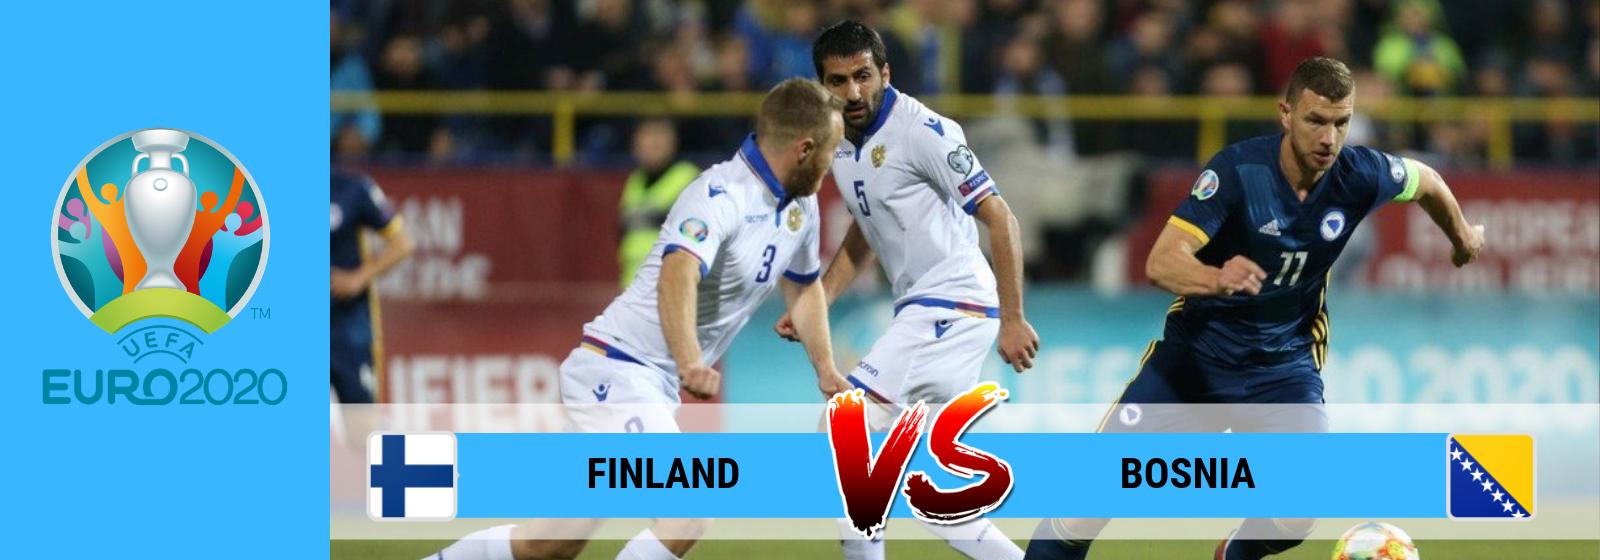 UEFA Euro 2020 Finland Vs. Bosnia Asian Connect